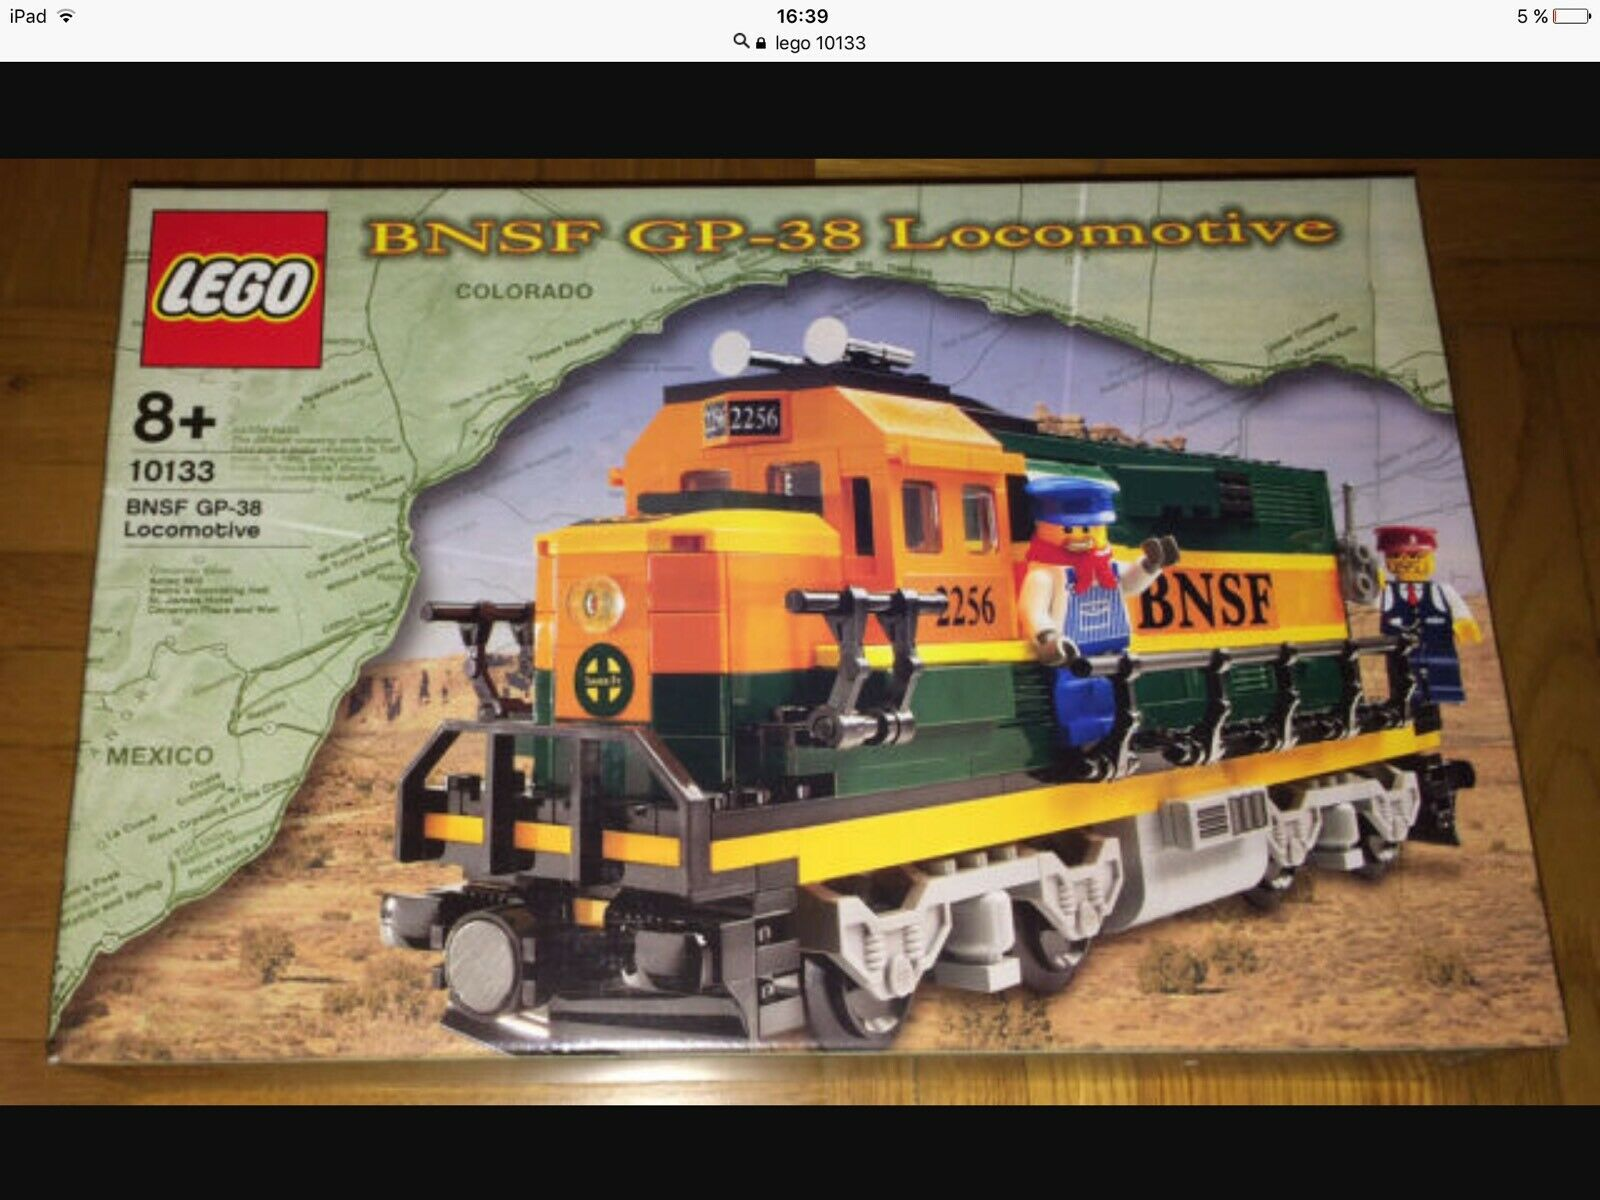 LEGO 10133 - Burlington Northern Santa Fe (BNSF) GP-38 Locomotive